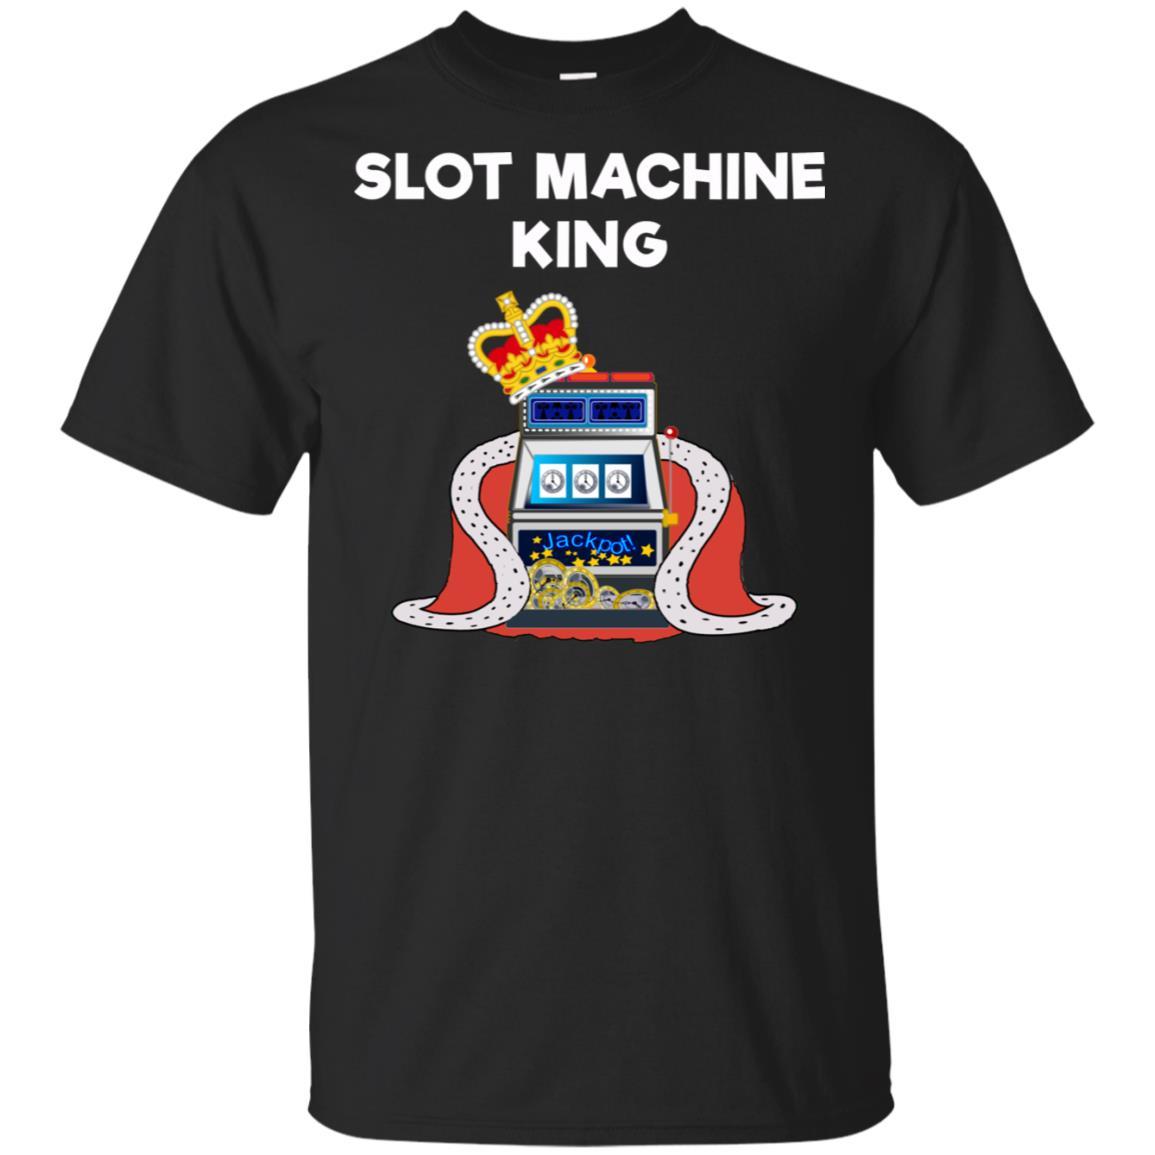 Slot Machine – Funny Casino Gambling King Unisex Short Sleeve